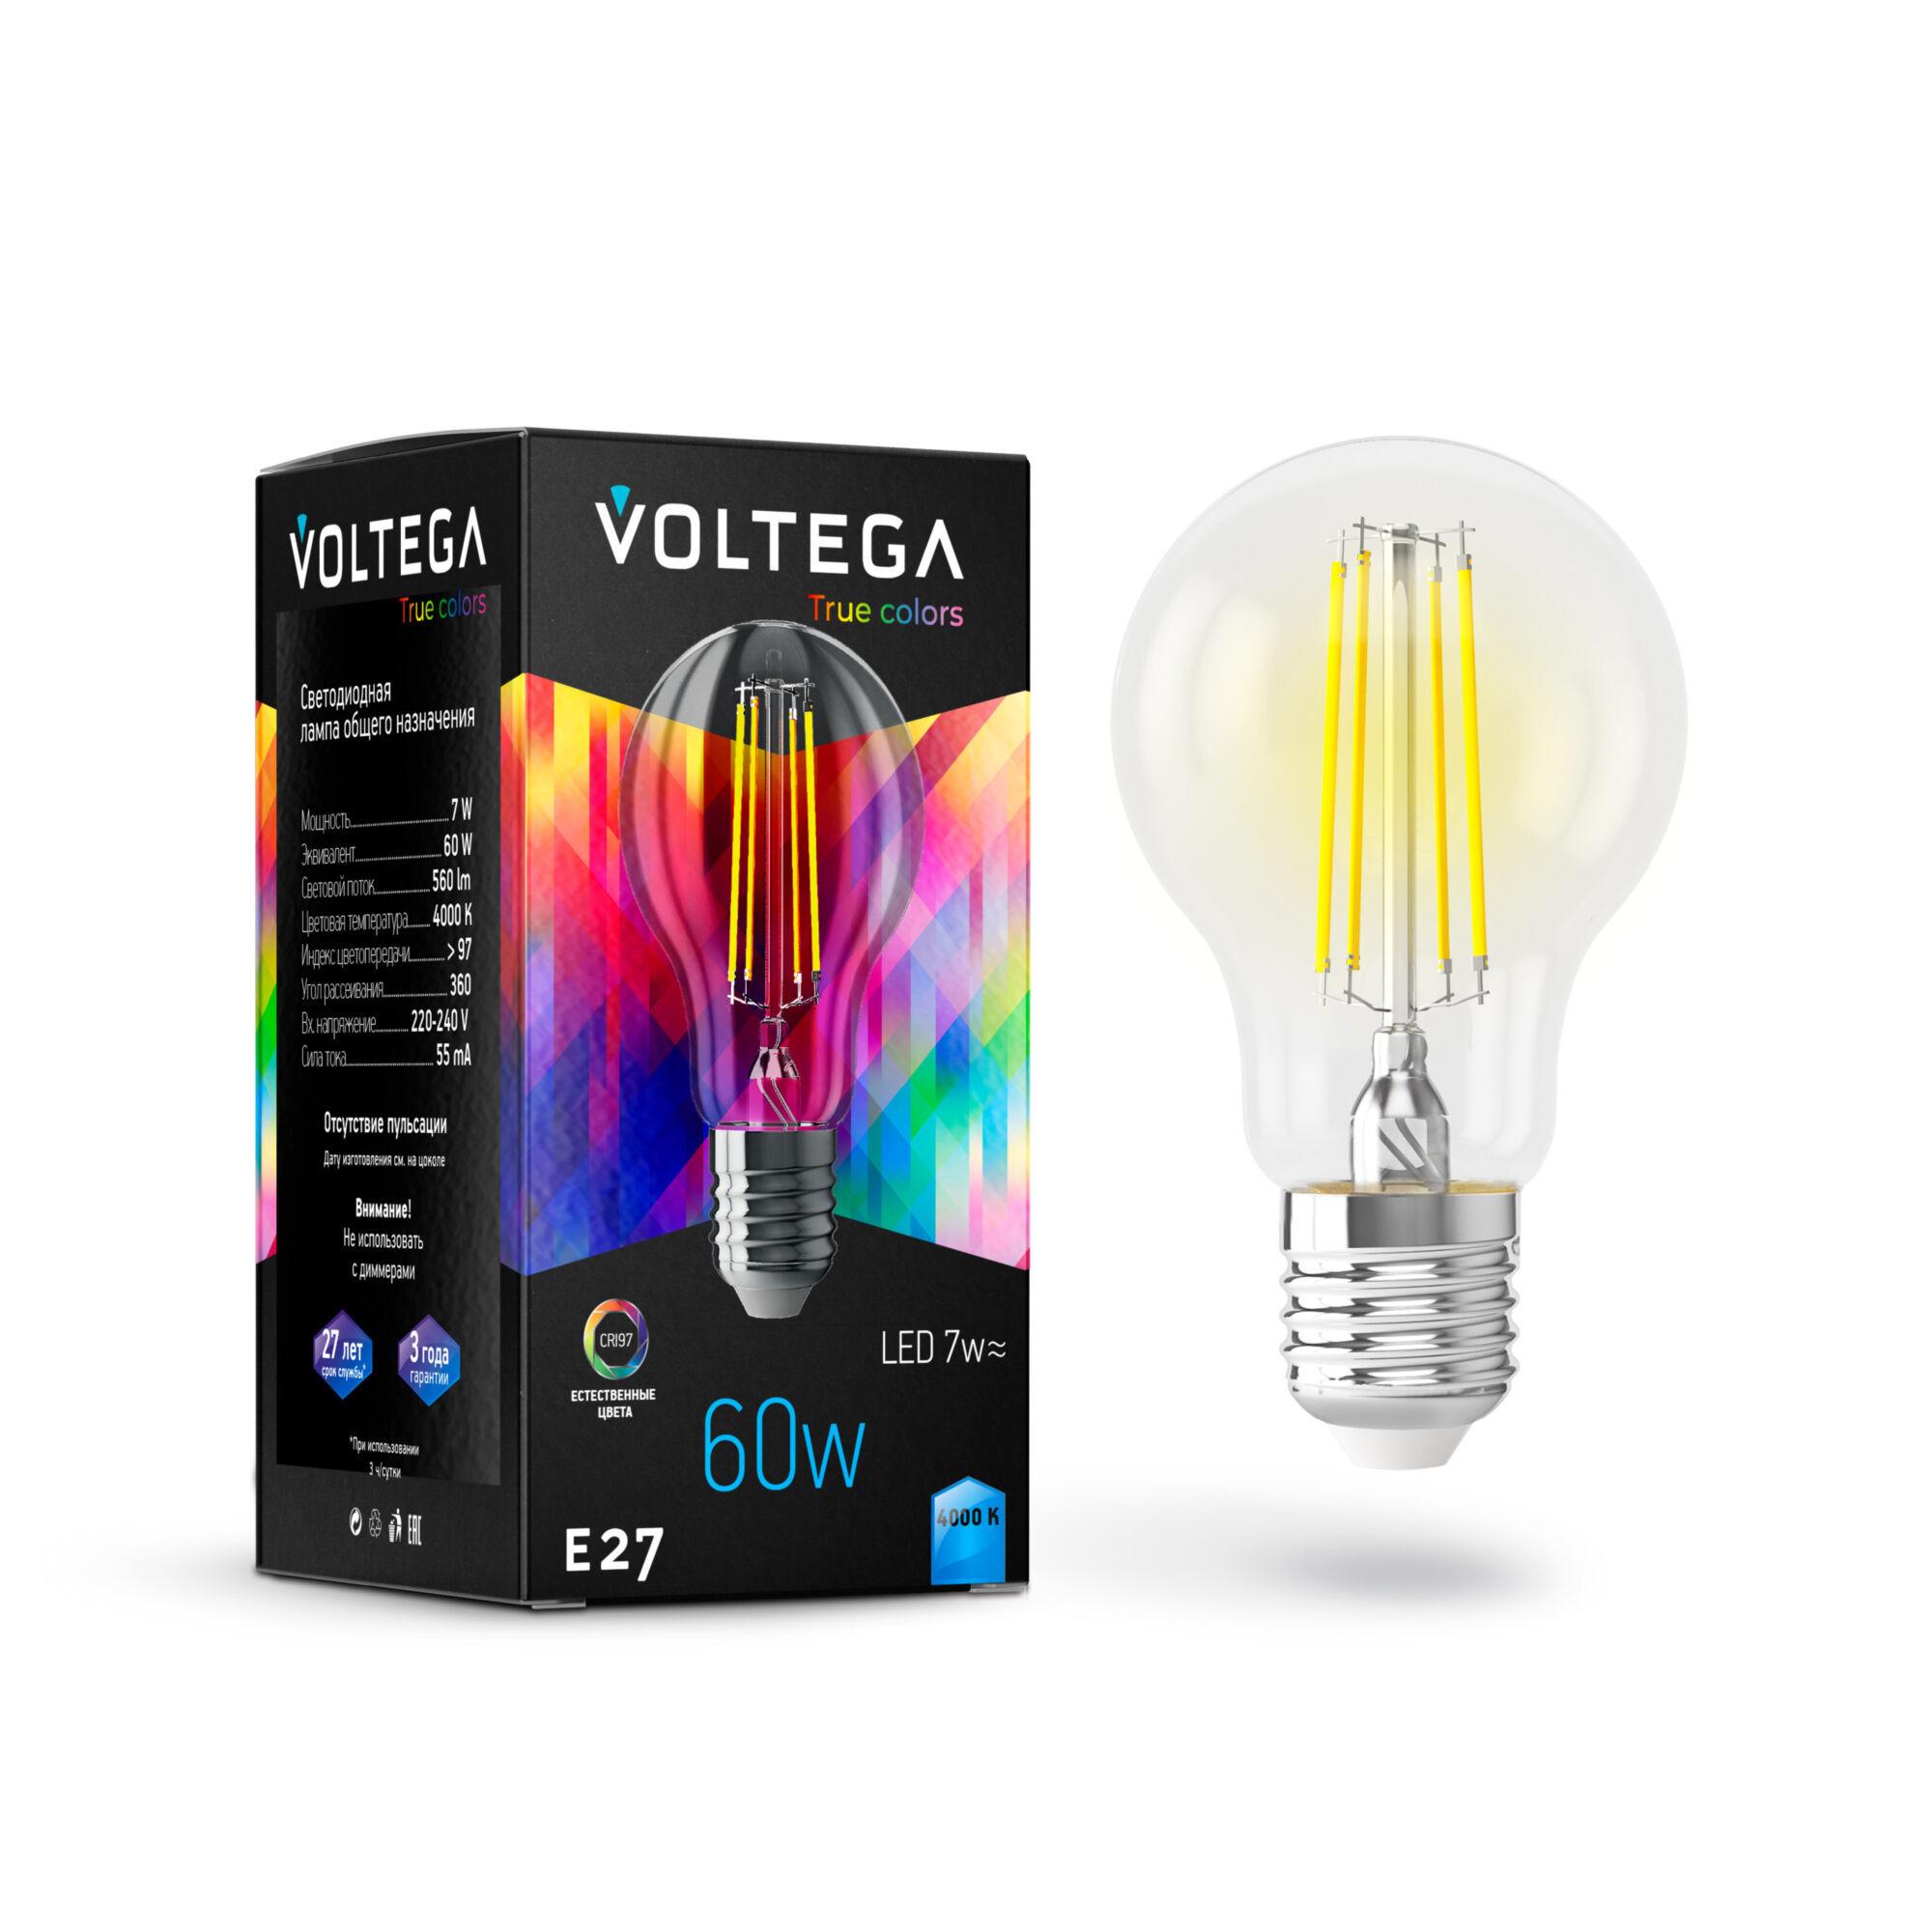 Филаментная светодиодная лампа Voltega VG10-A60E27cold7W-FHR 7155 груша E27 7W, 4000K 220-240V, гарантия 3 года - фото 2